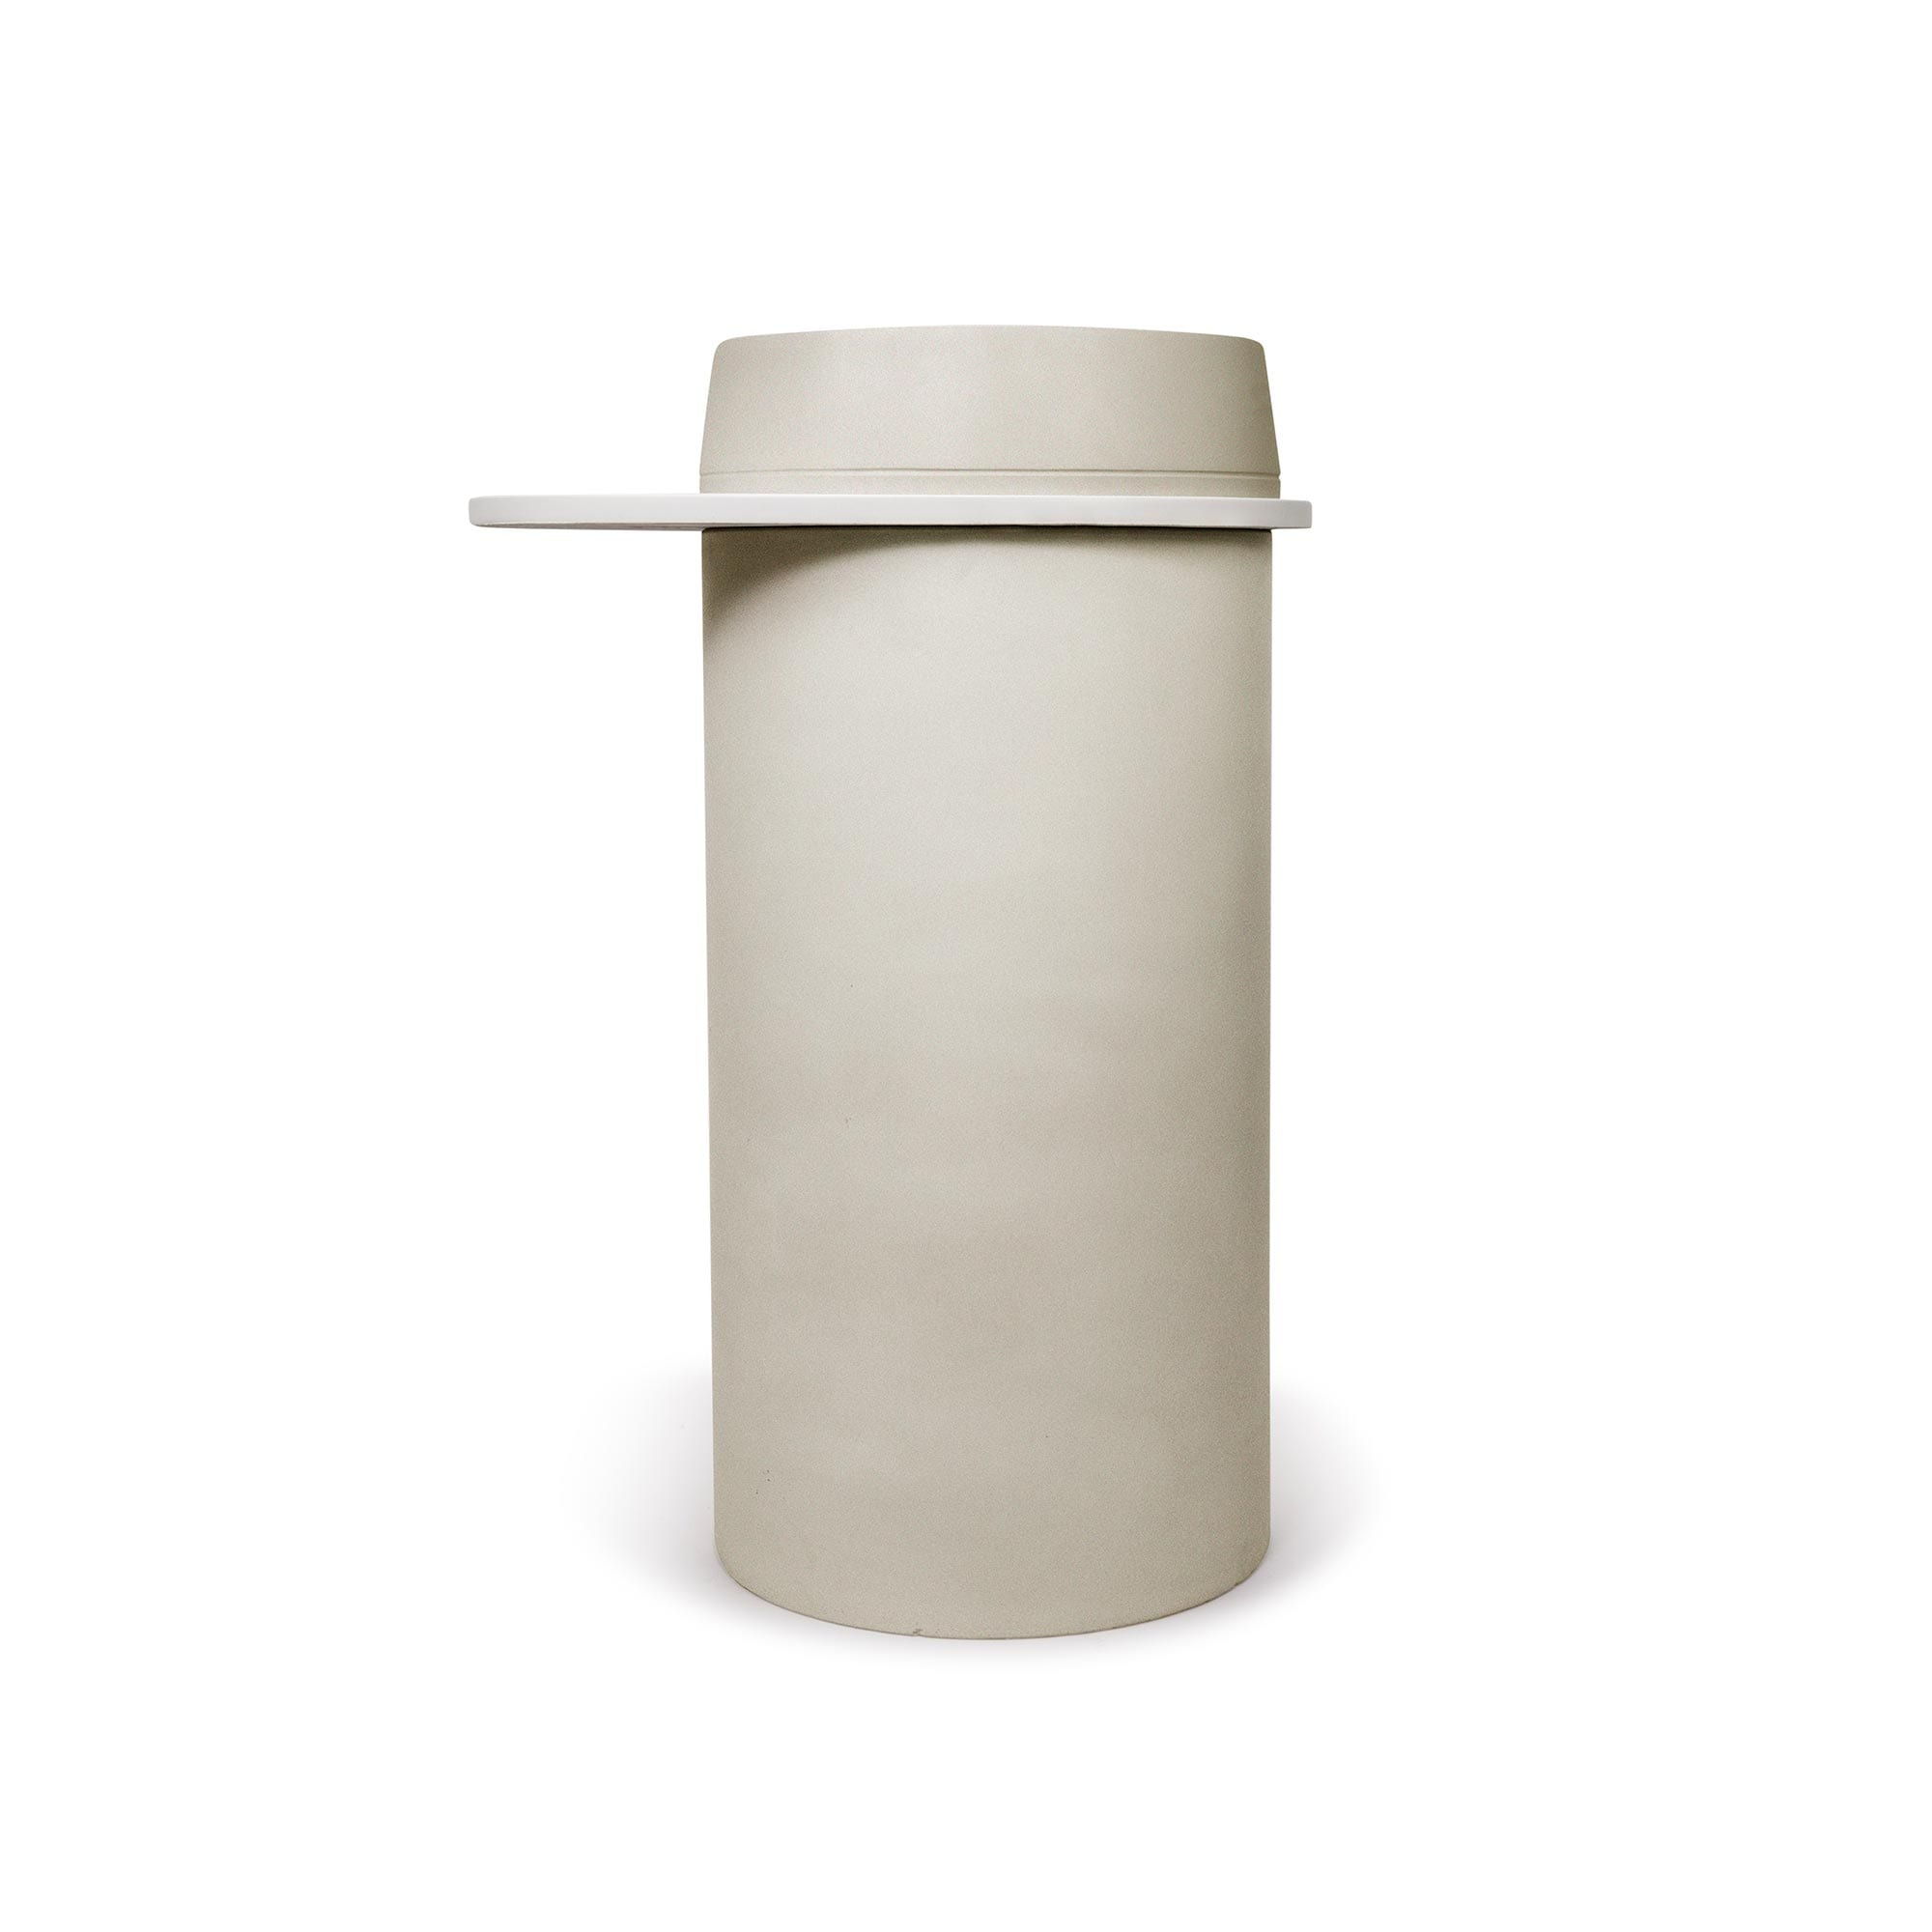 Funl Basin Cylinder 13